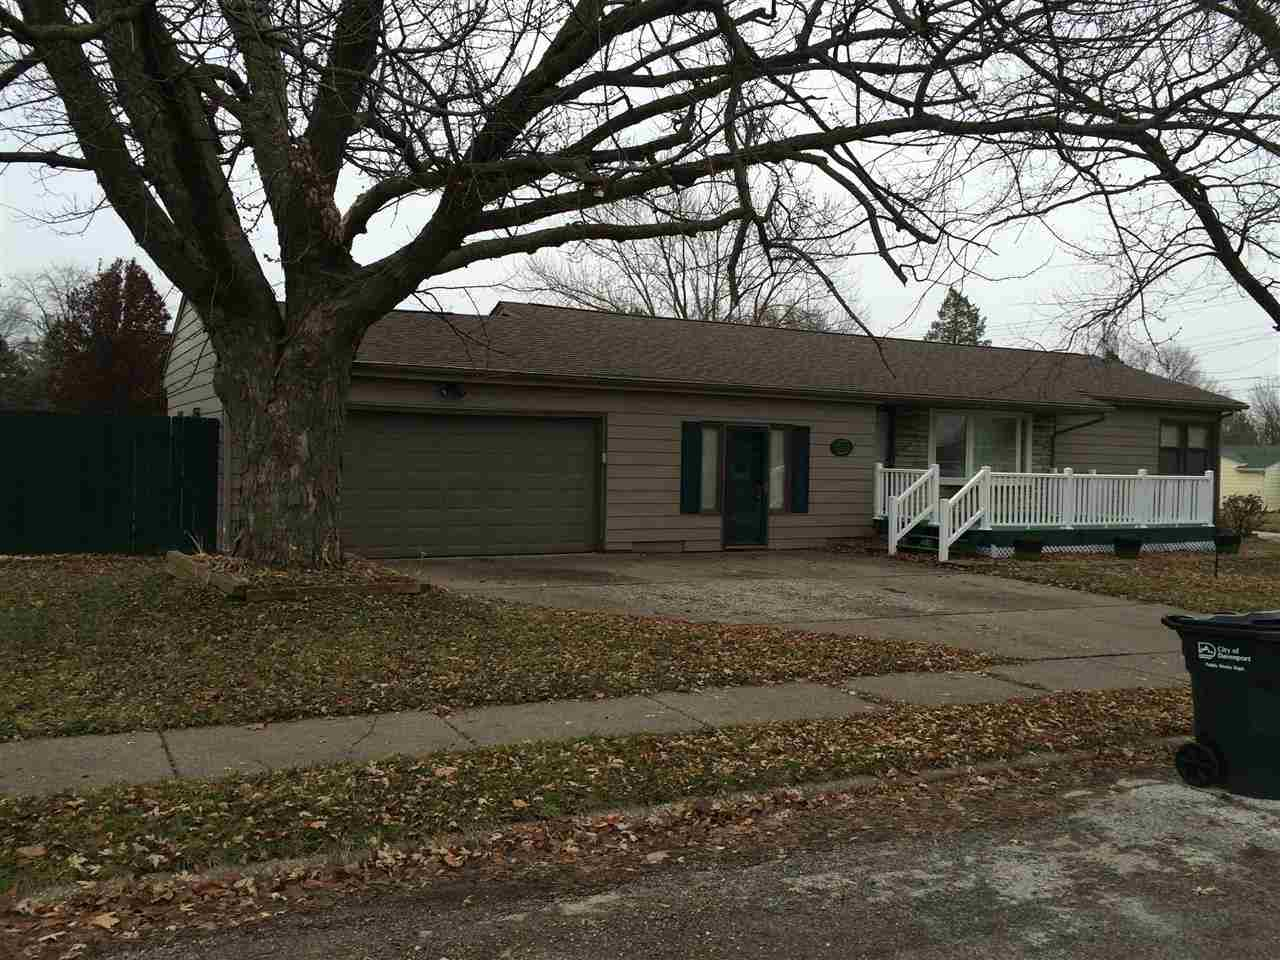 Rental Homes for Rent, ListingId:30830601, location: 1305 N ELMWOOD Avenue Davenport 52804